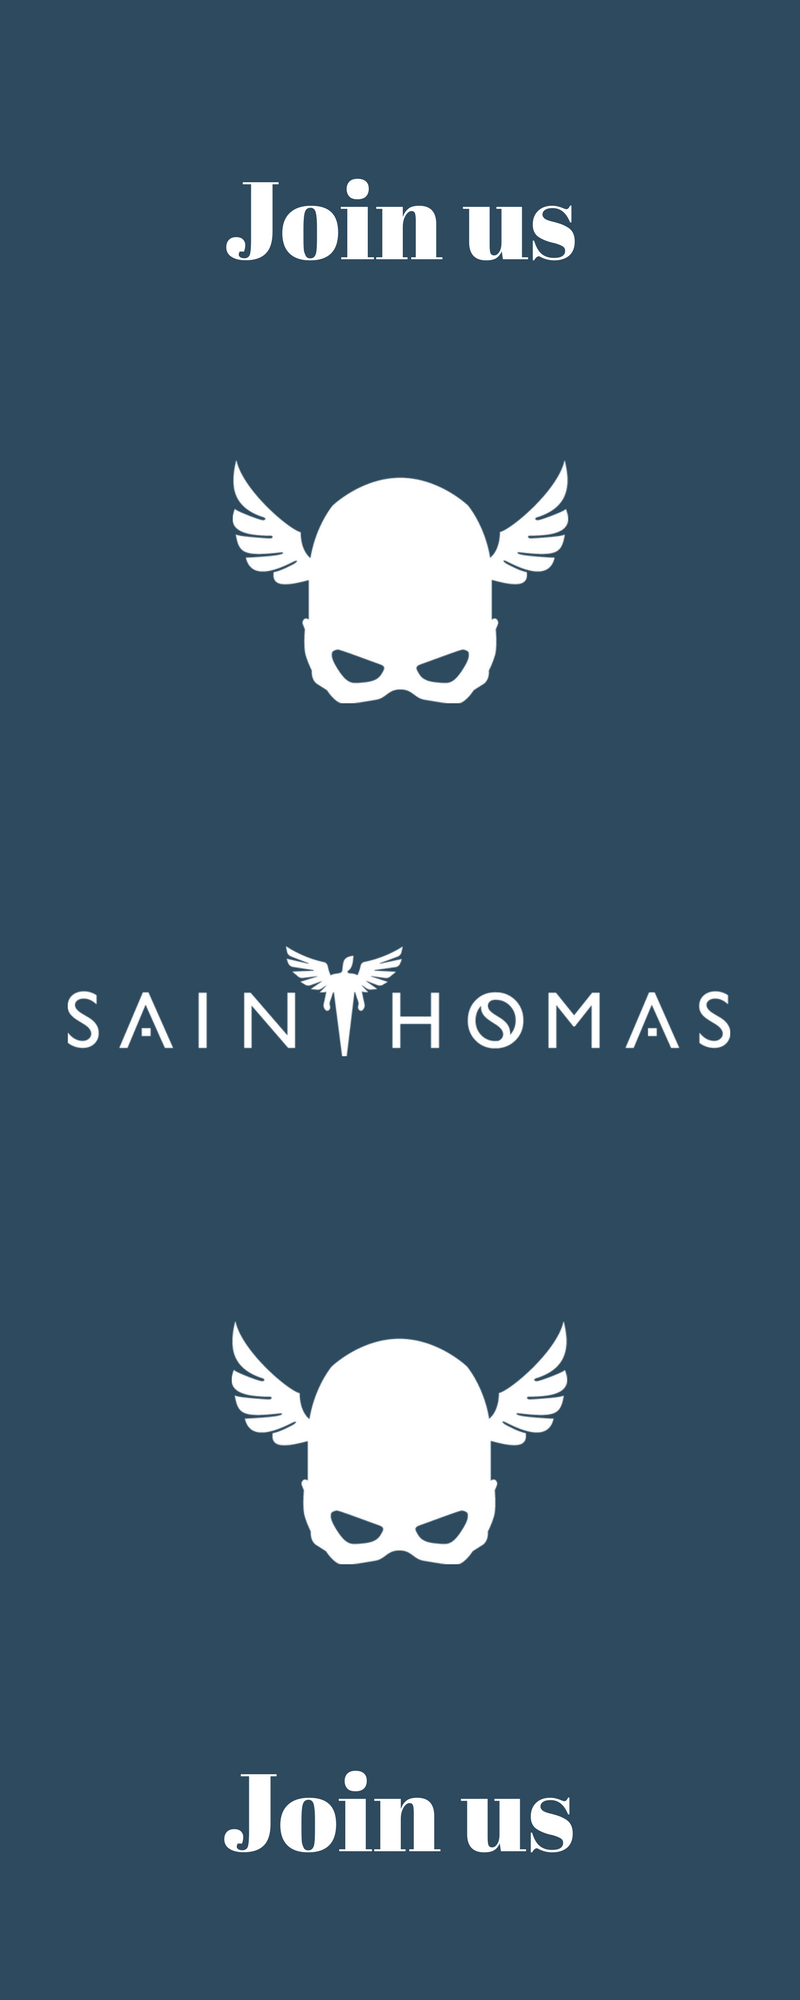 Sainthomas Ad